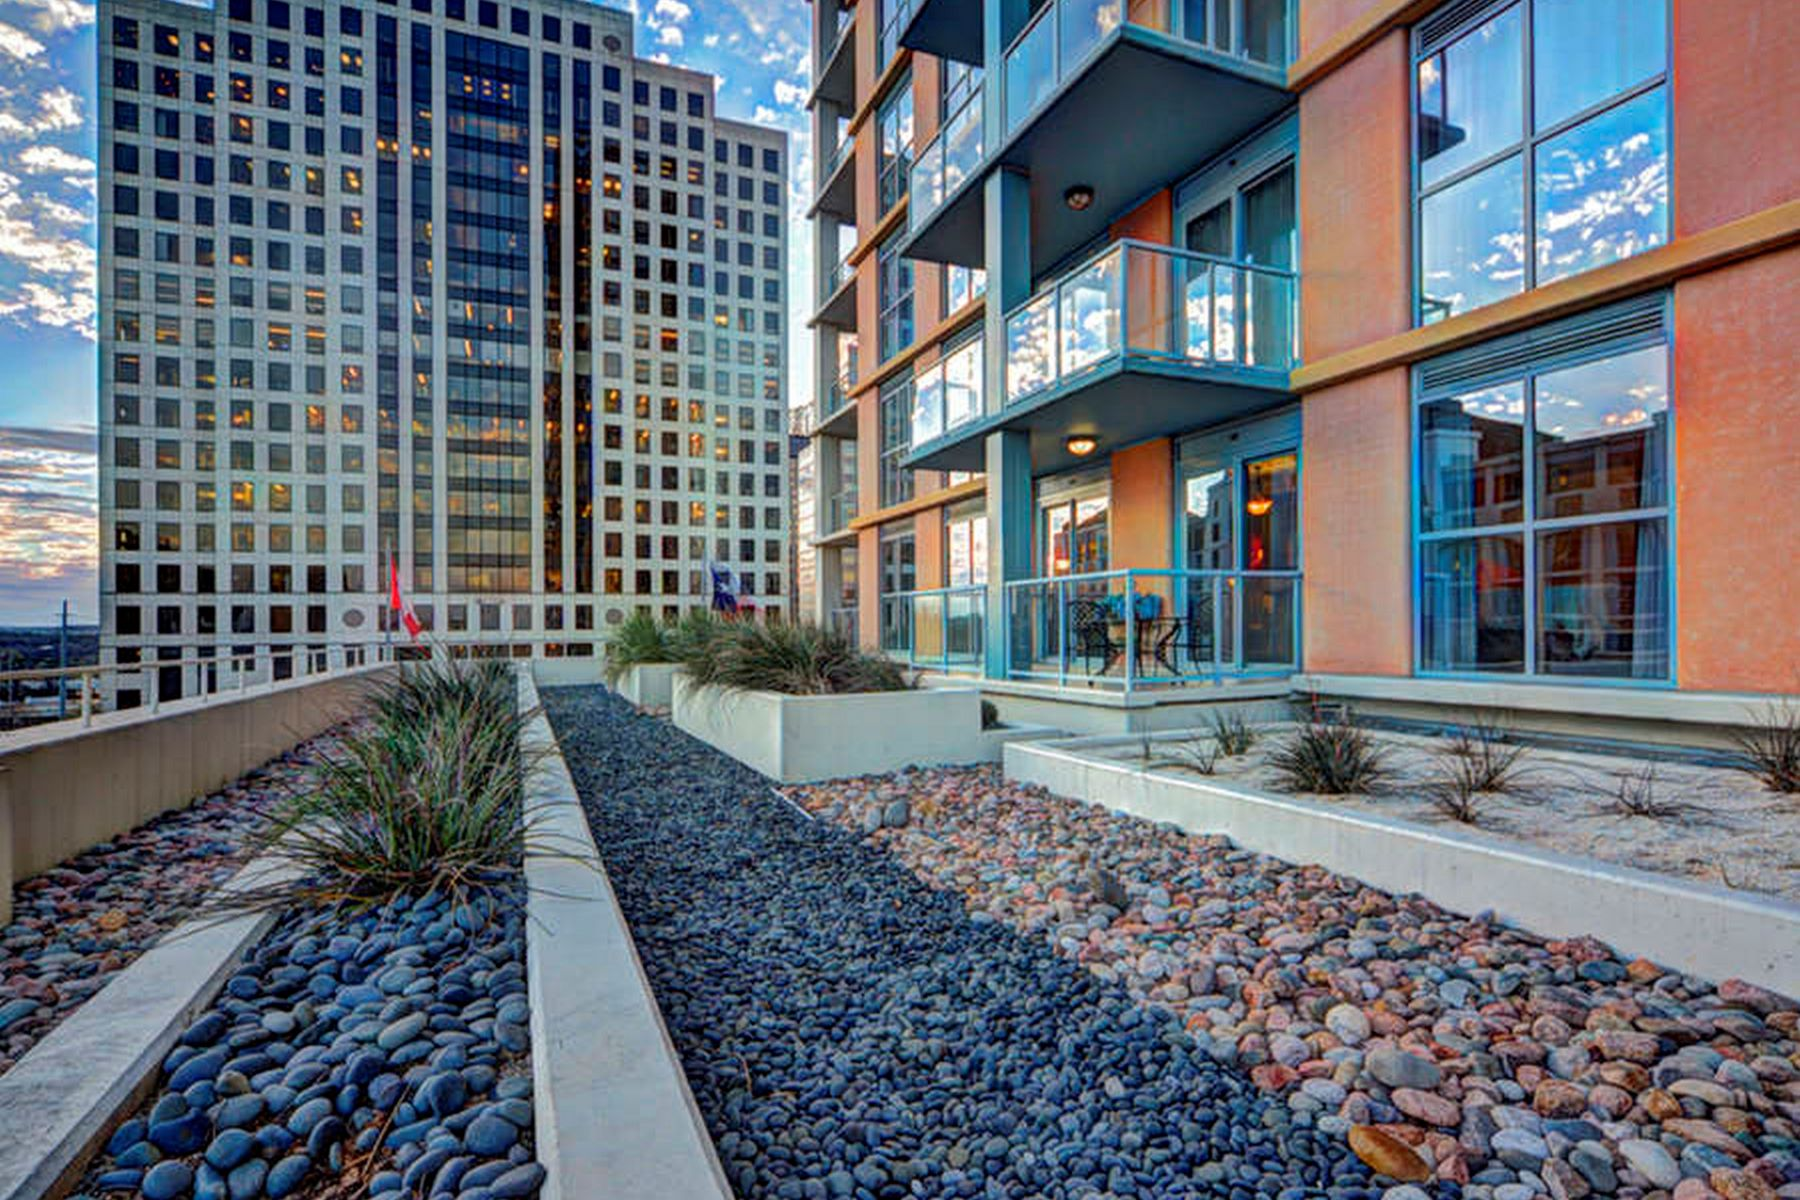 Condominium for Sale at Sophisticated Elegance, Four Seasons Residences 98 San Jacinto Blvd 601 Austin, Texas 78701 United States